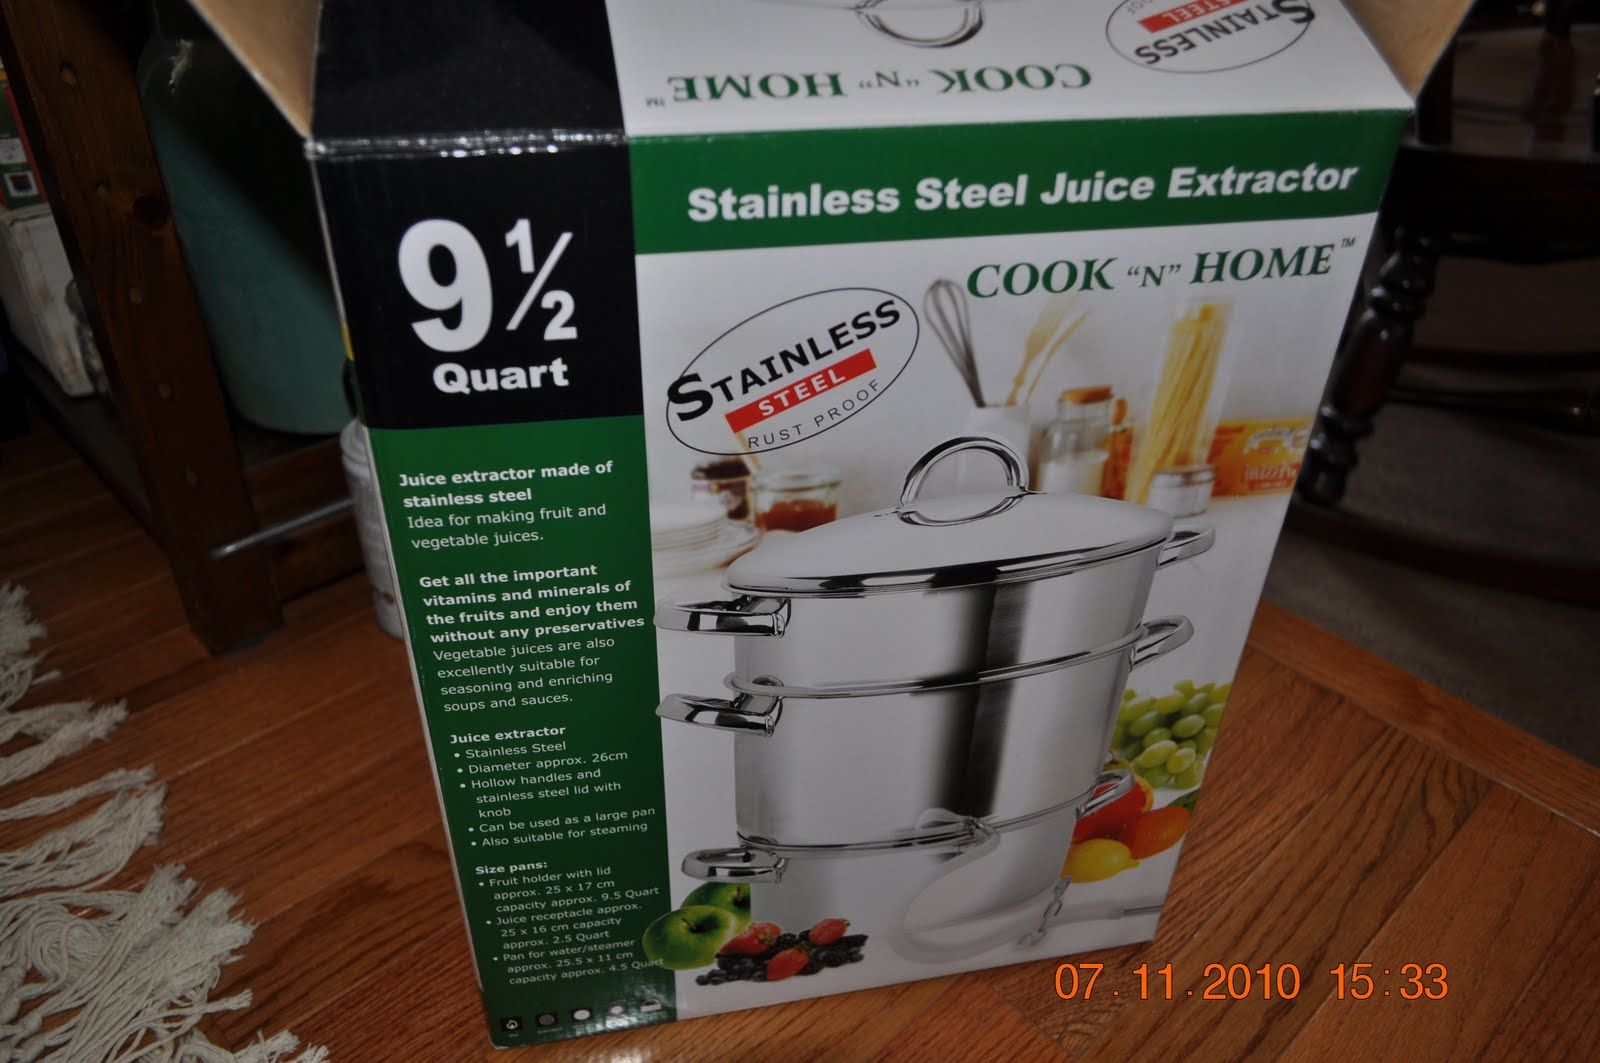 http://1.bp.blogspot.com/_shgHP-5-o6E/TDp6H3bhMMI/AAAAAAAADKc/yxzh8LFG7So/s1600/juice+extractor1.JPG